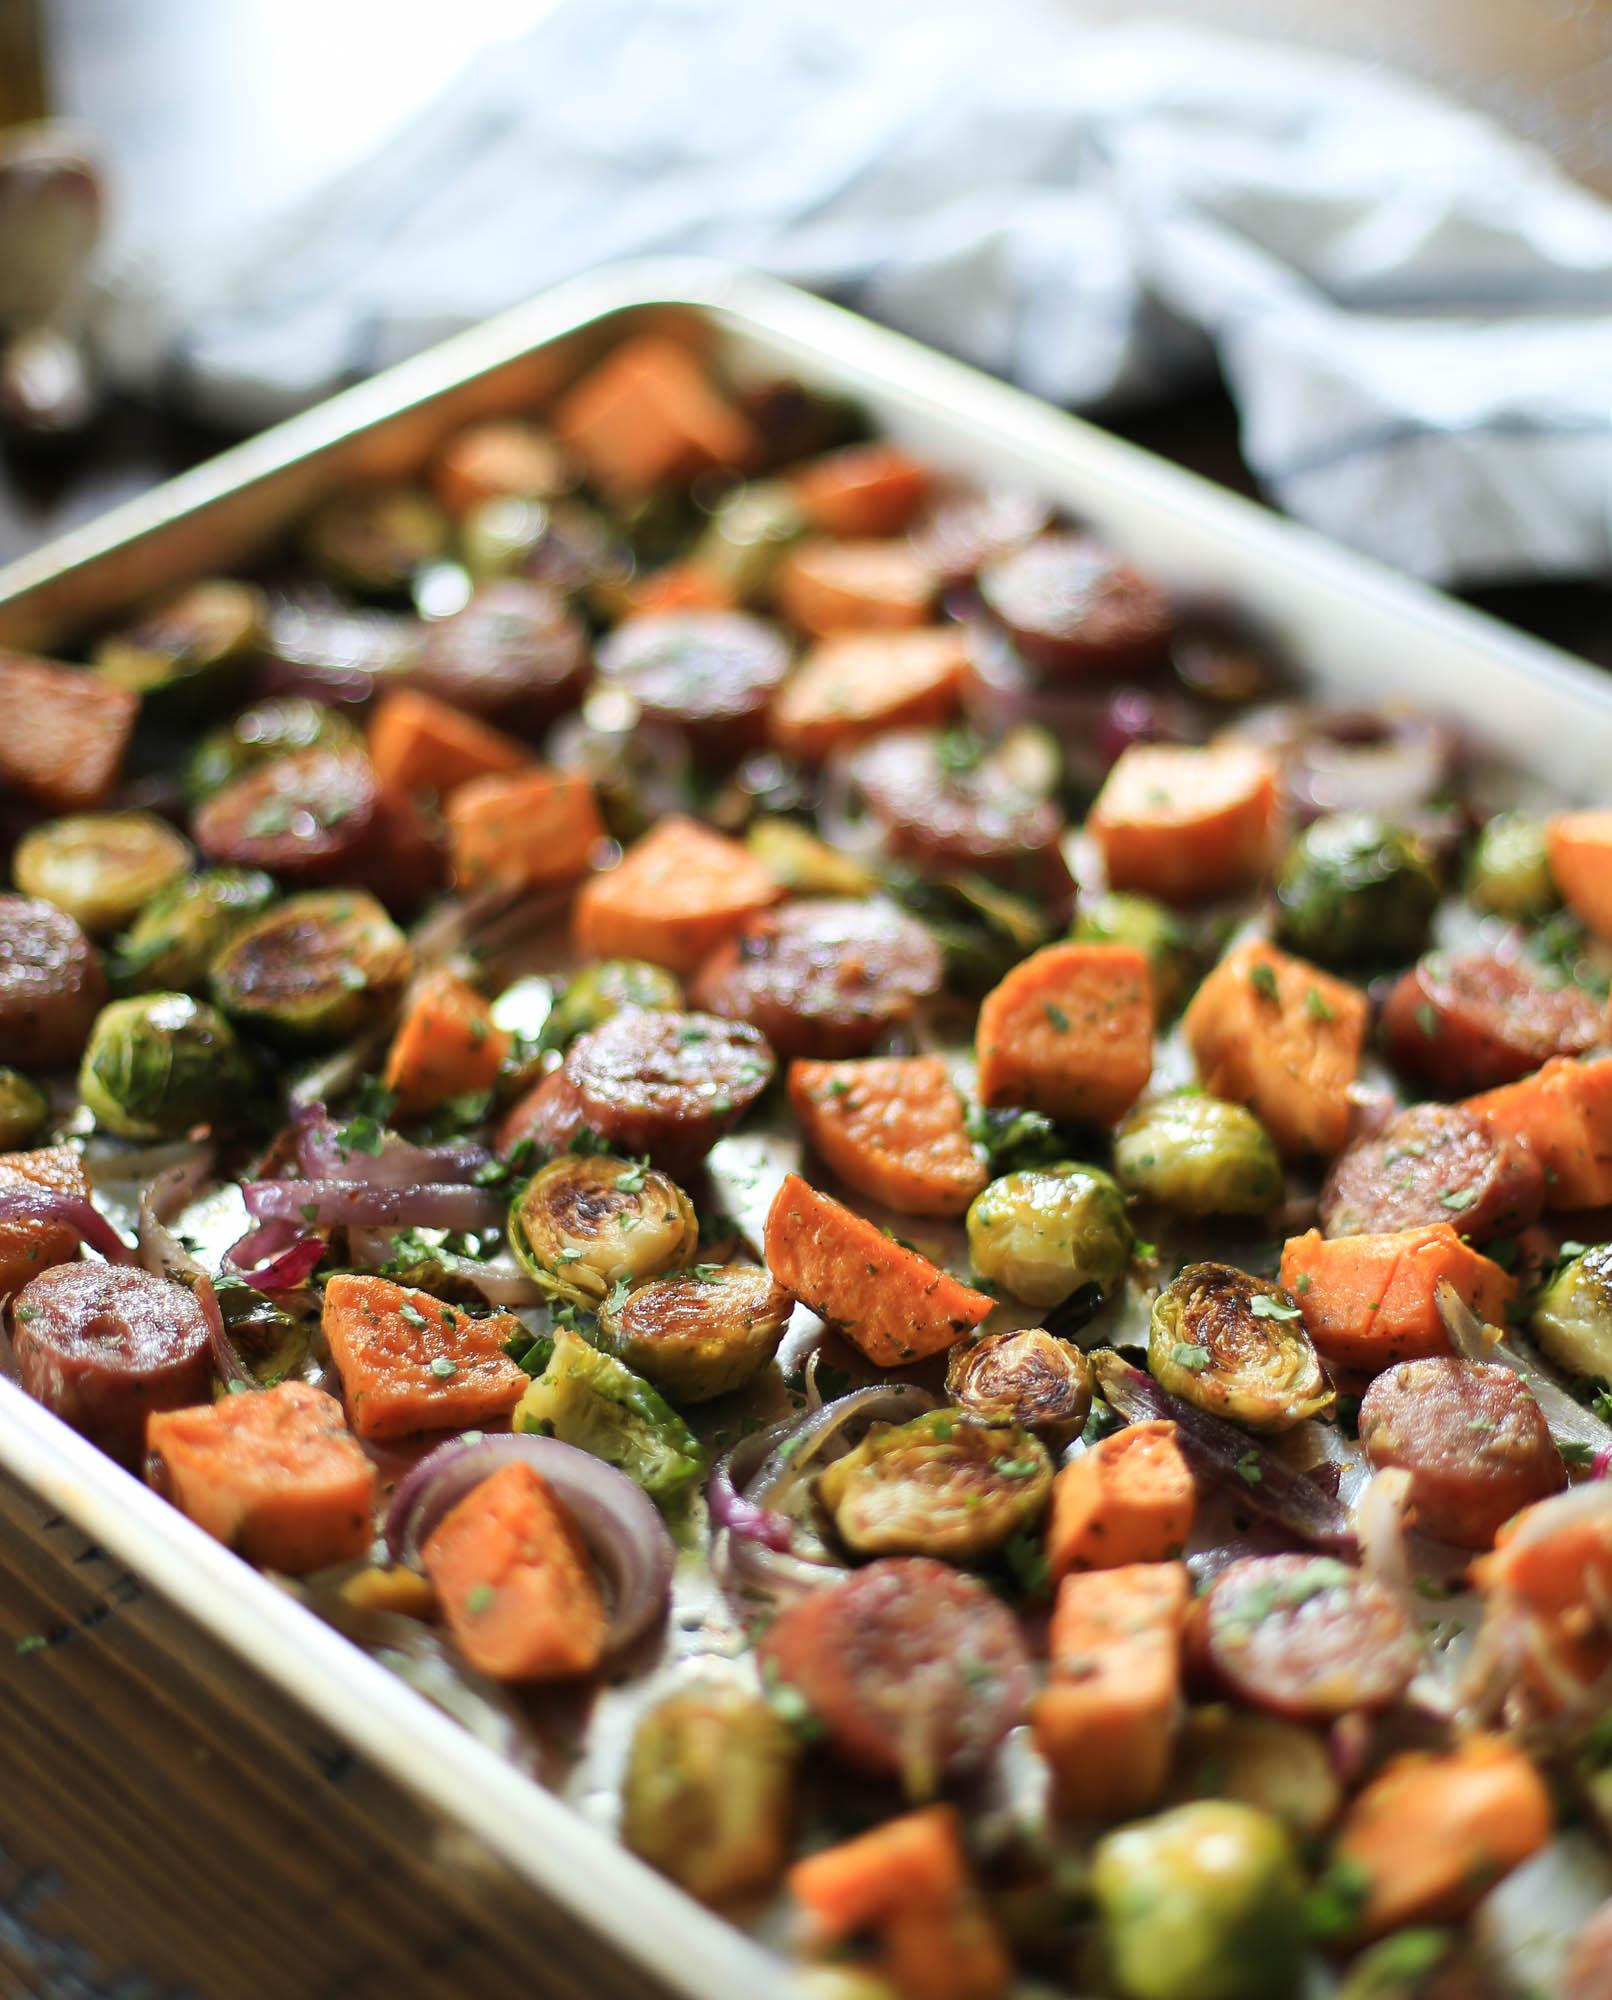 Pan-Roasted Sausage and Veggies